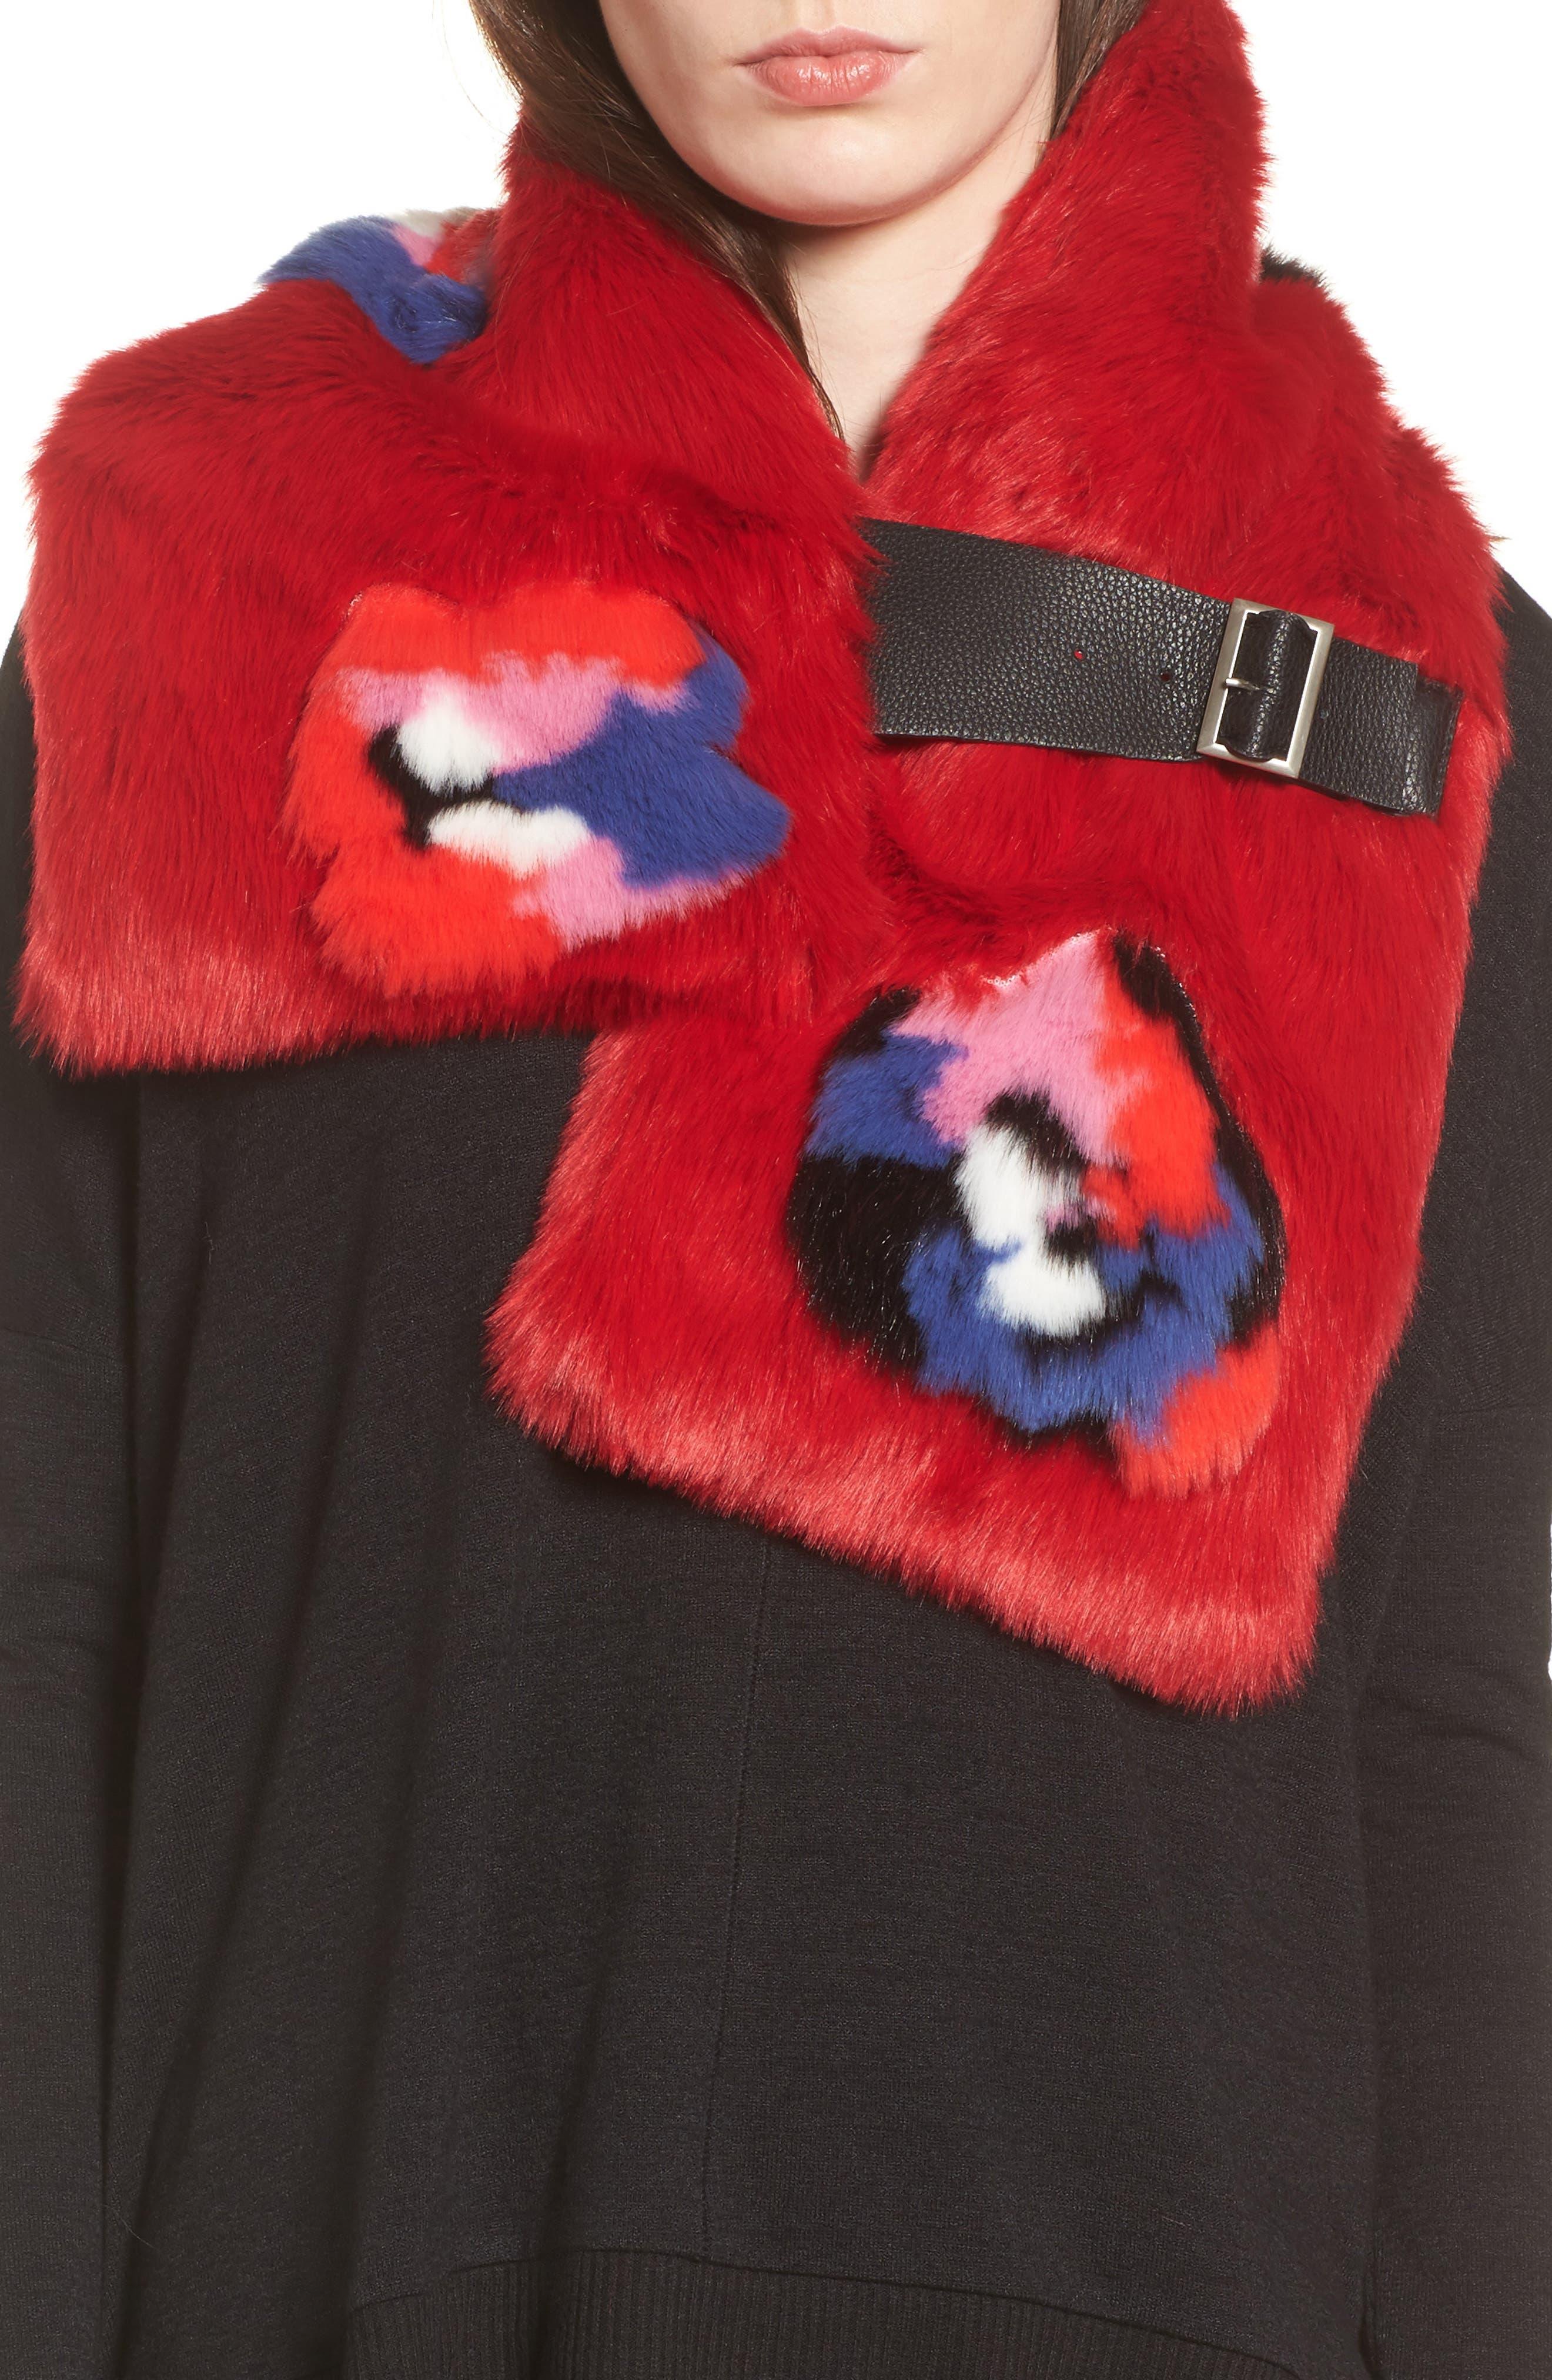 Buckled Faux Fur Scarf,                             Main thumbnail 1, color,                             Floral Fur